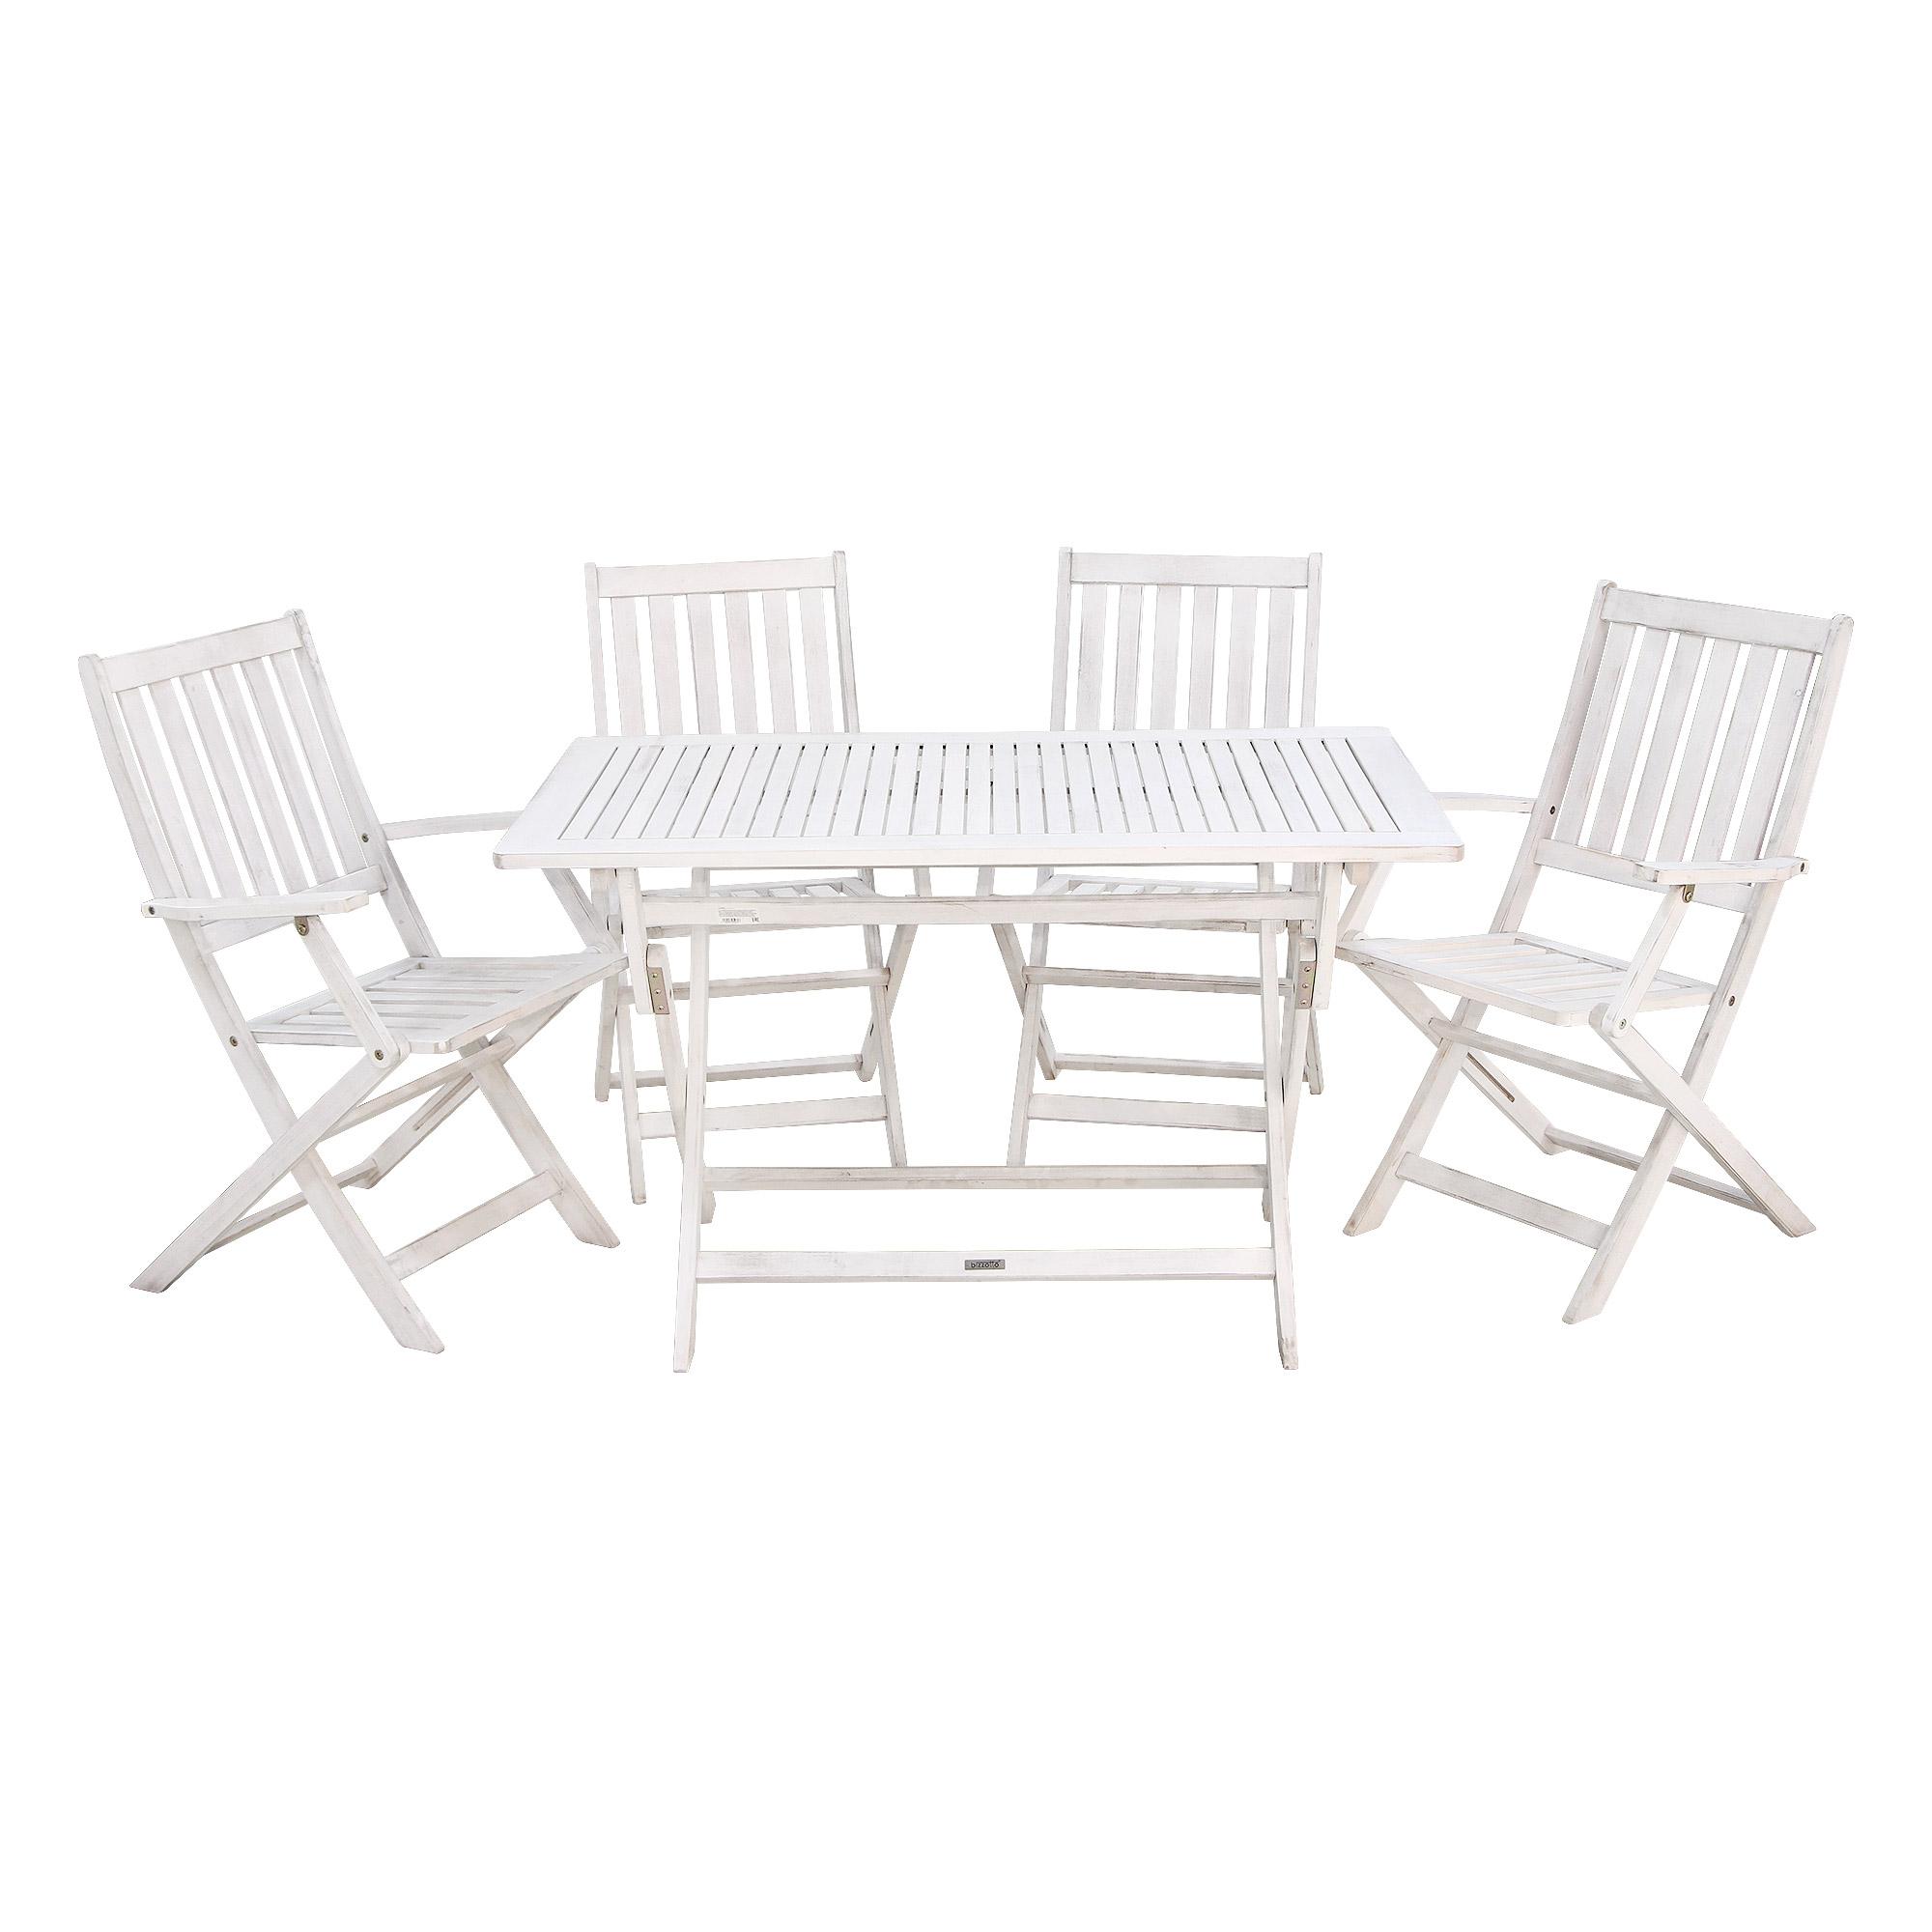 Комплект мебели Bizzotto octavia стол + 4 стула фото